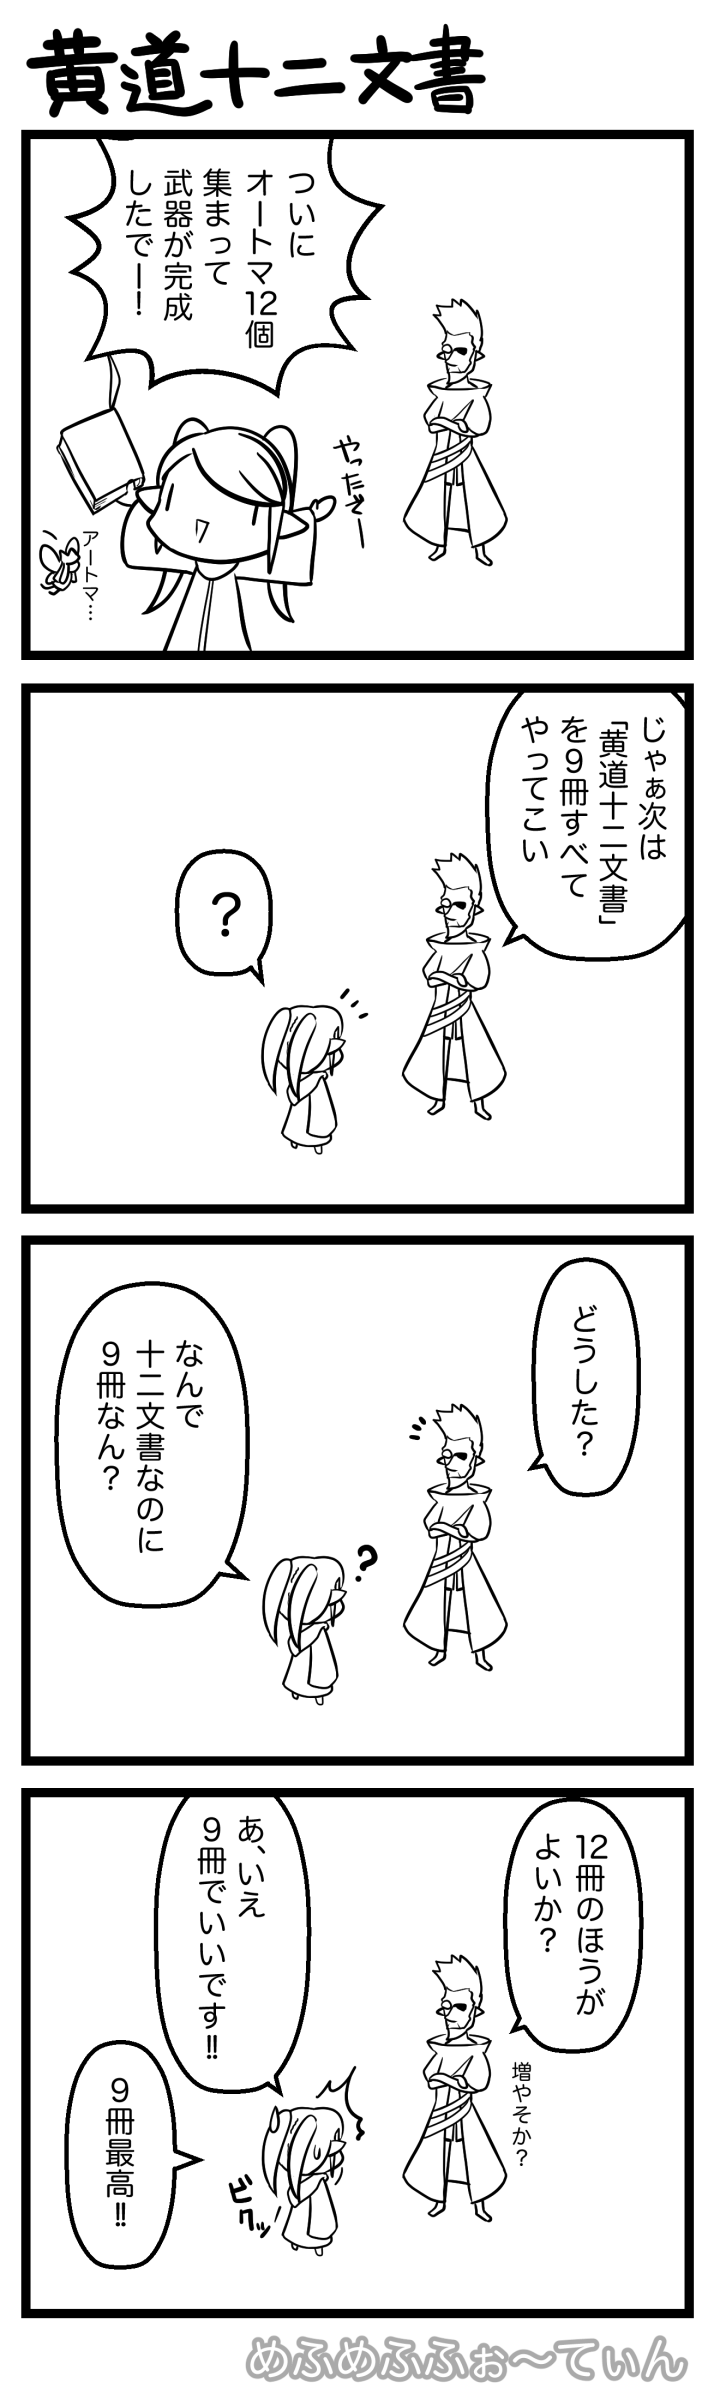 f:id:mefu3:20150619191607p:plain:h1200